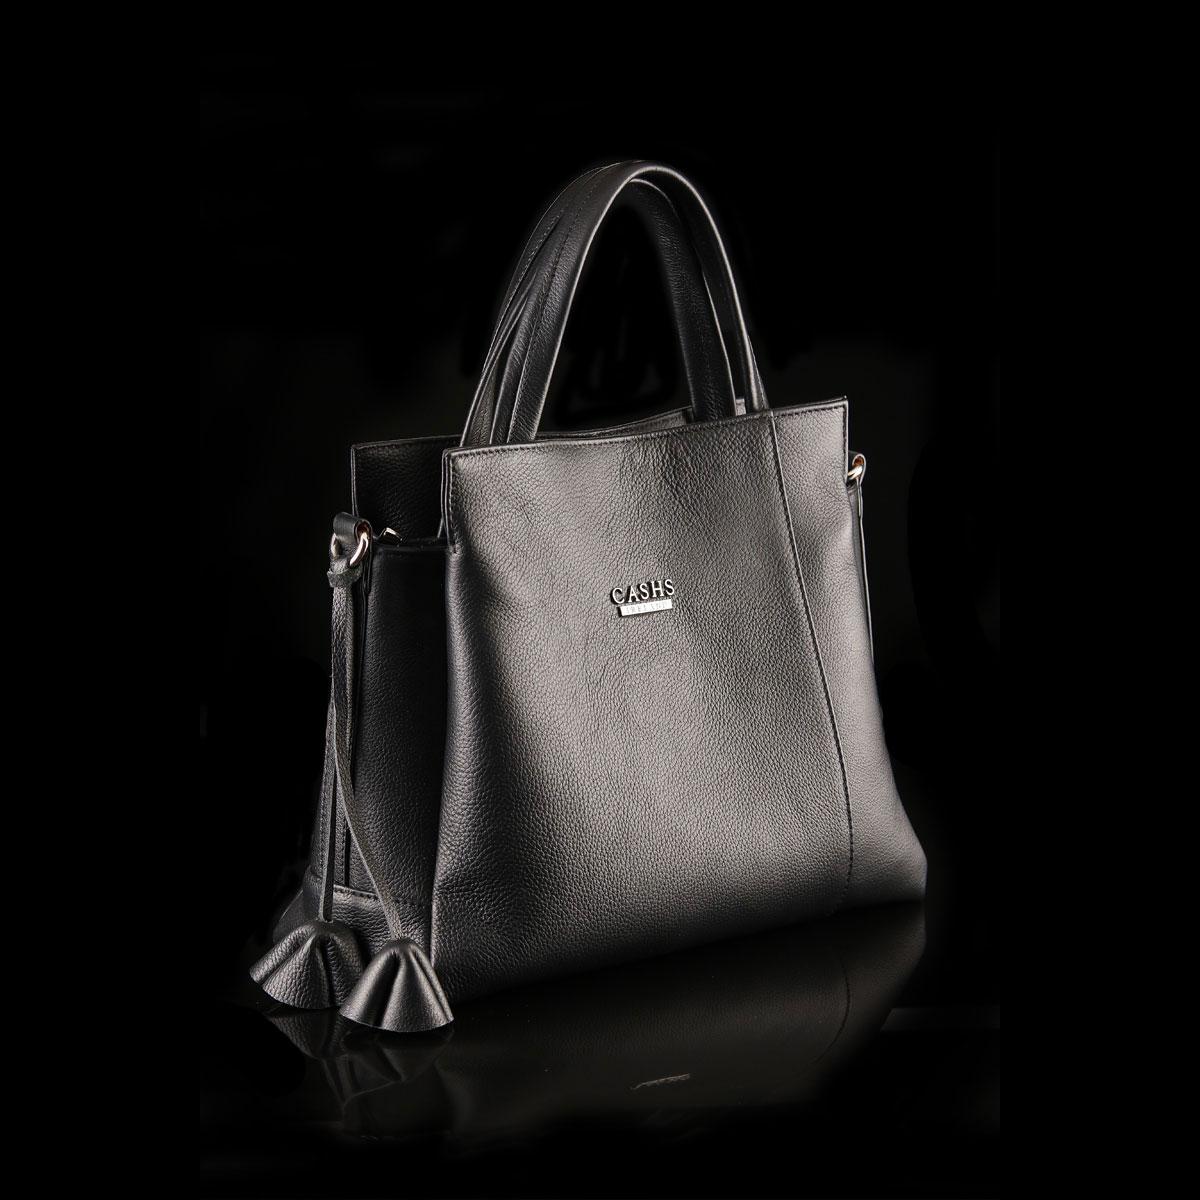 Cashs Ireland, Top Grain Leather Leona Handbag, Black